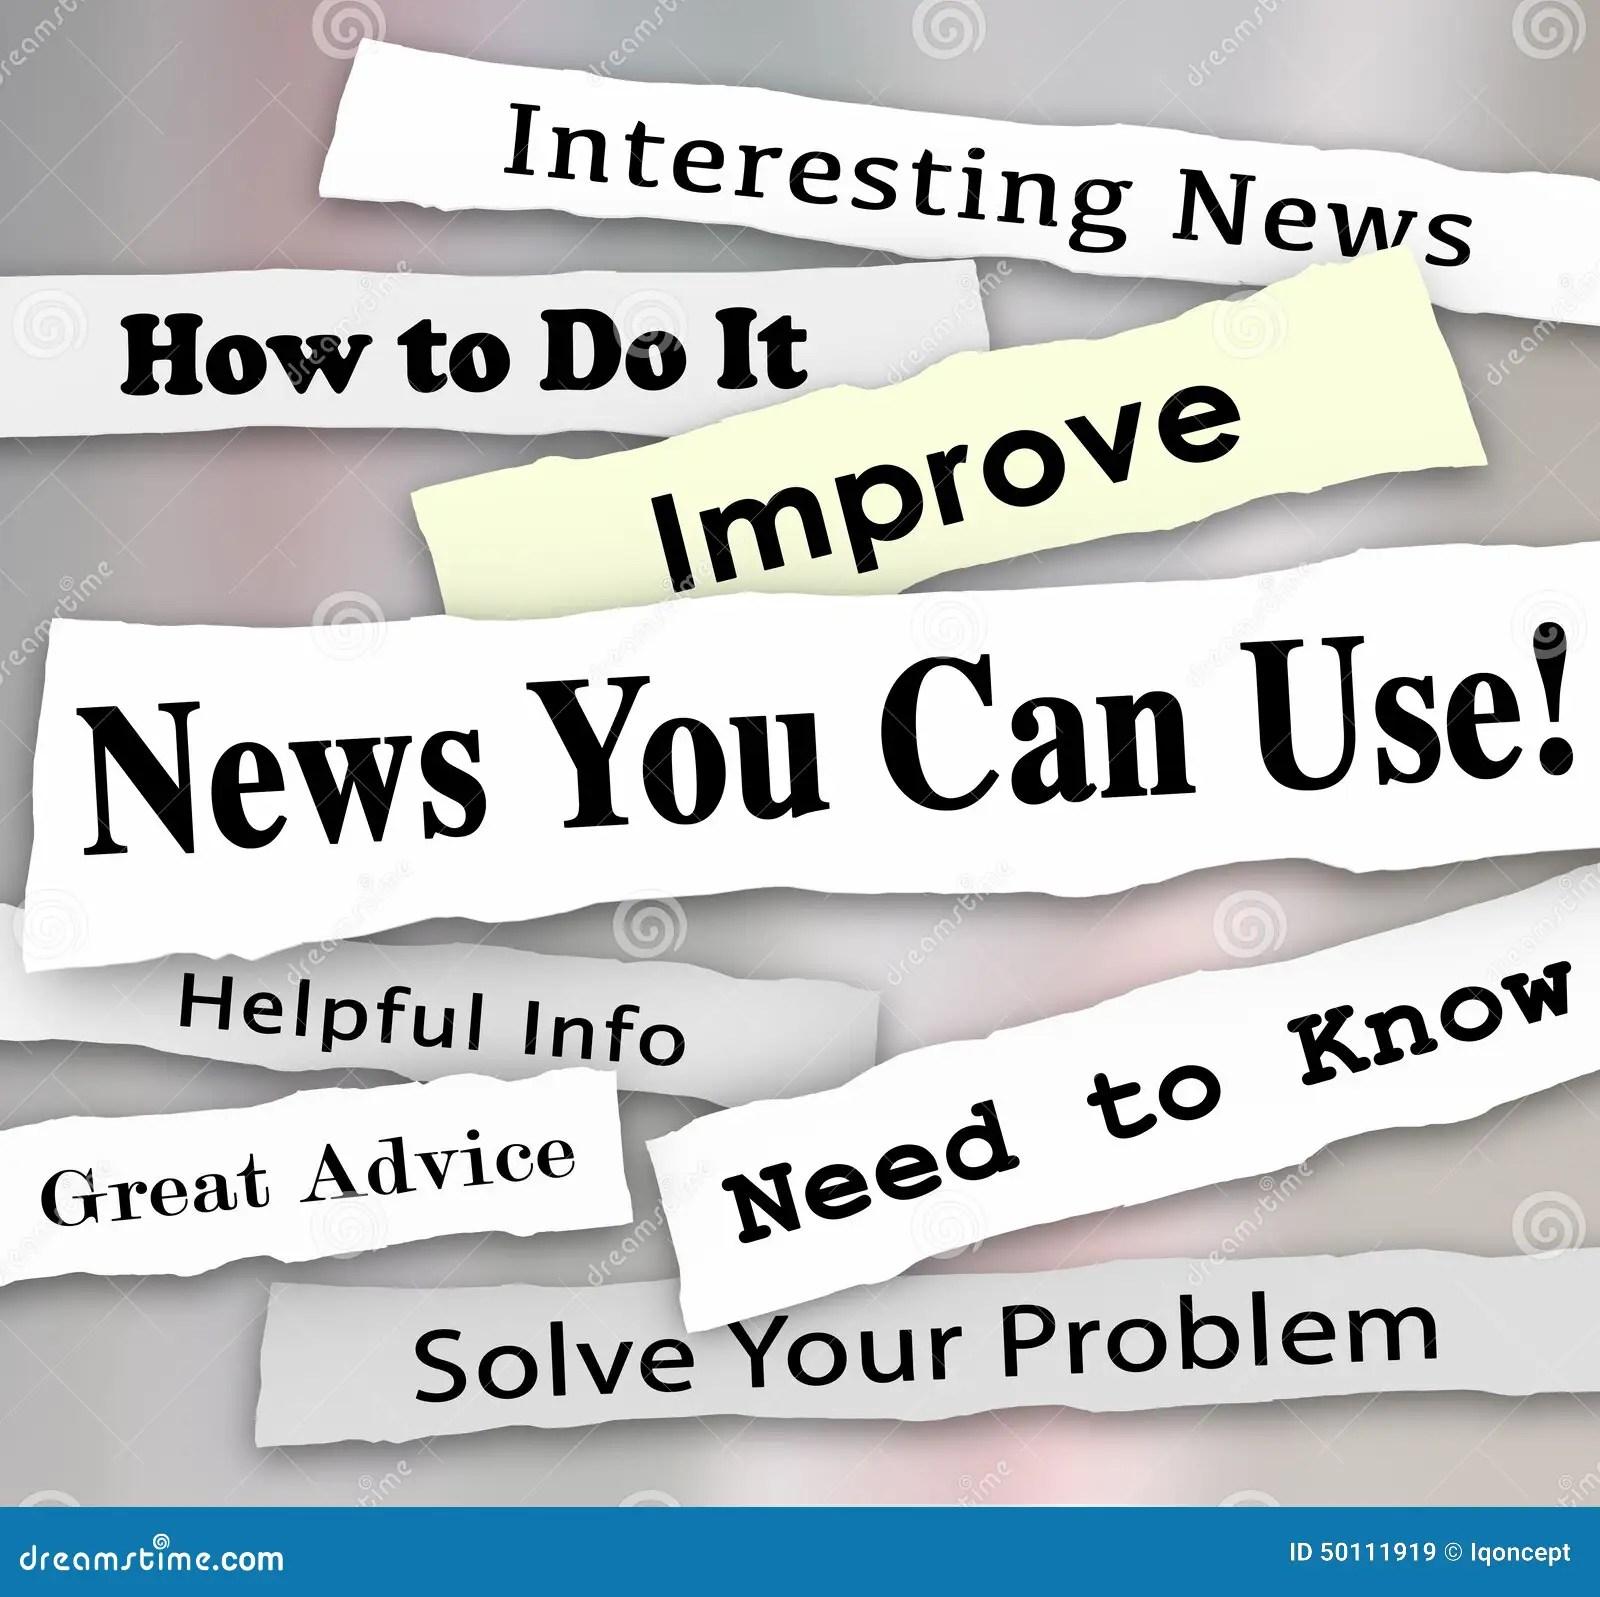 News You Can Use Newspaper Headline Articles Helpful